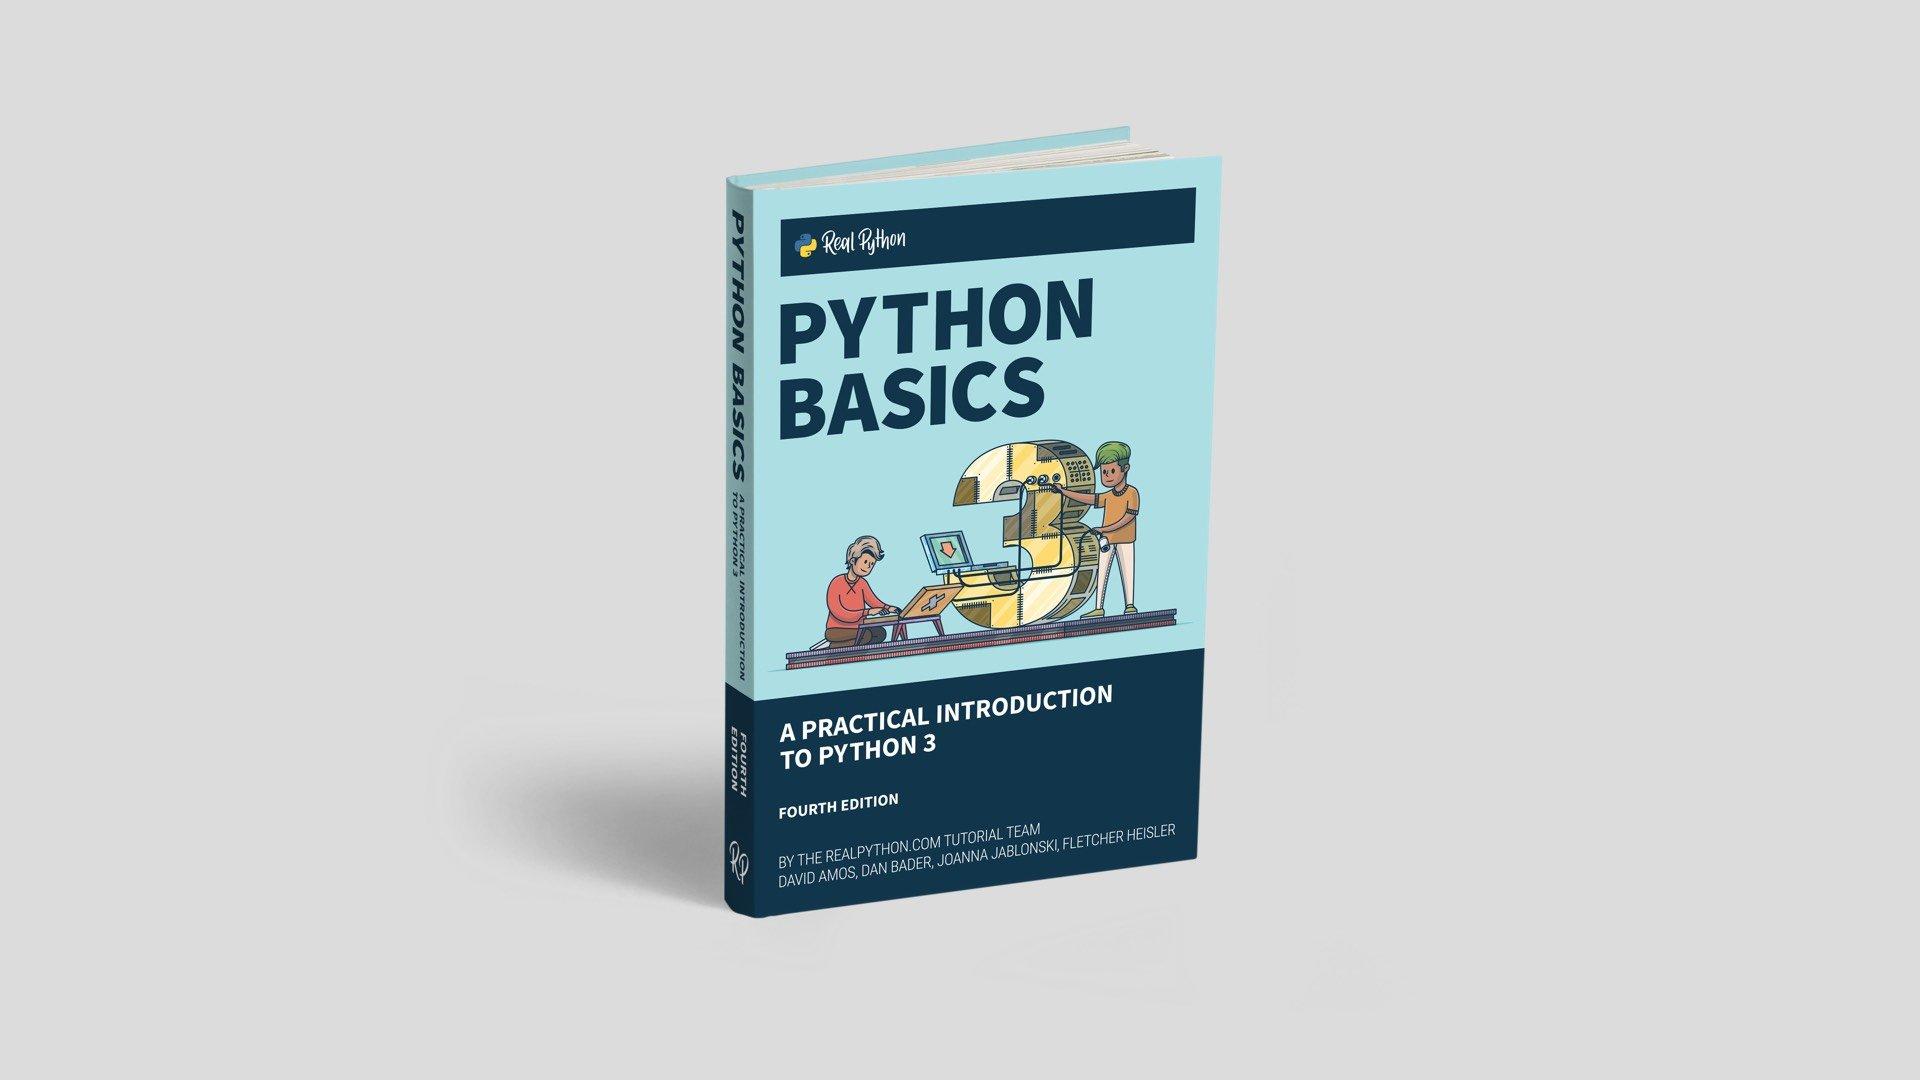 Python Basics Book: A Practical Introduction to Python 3